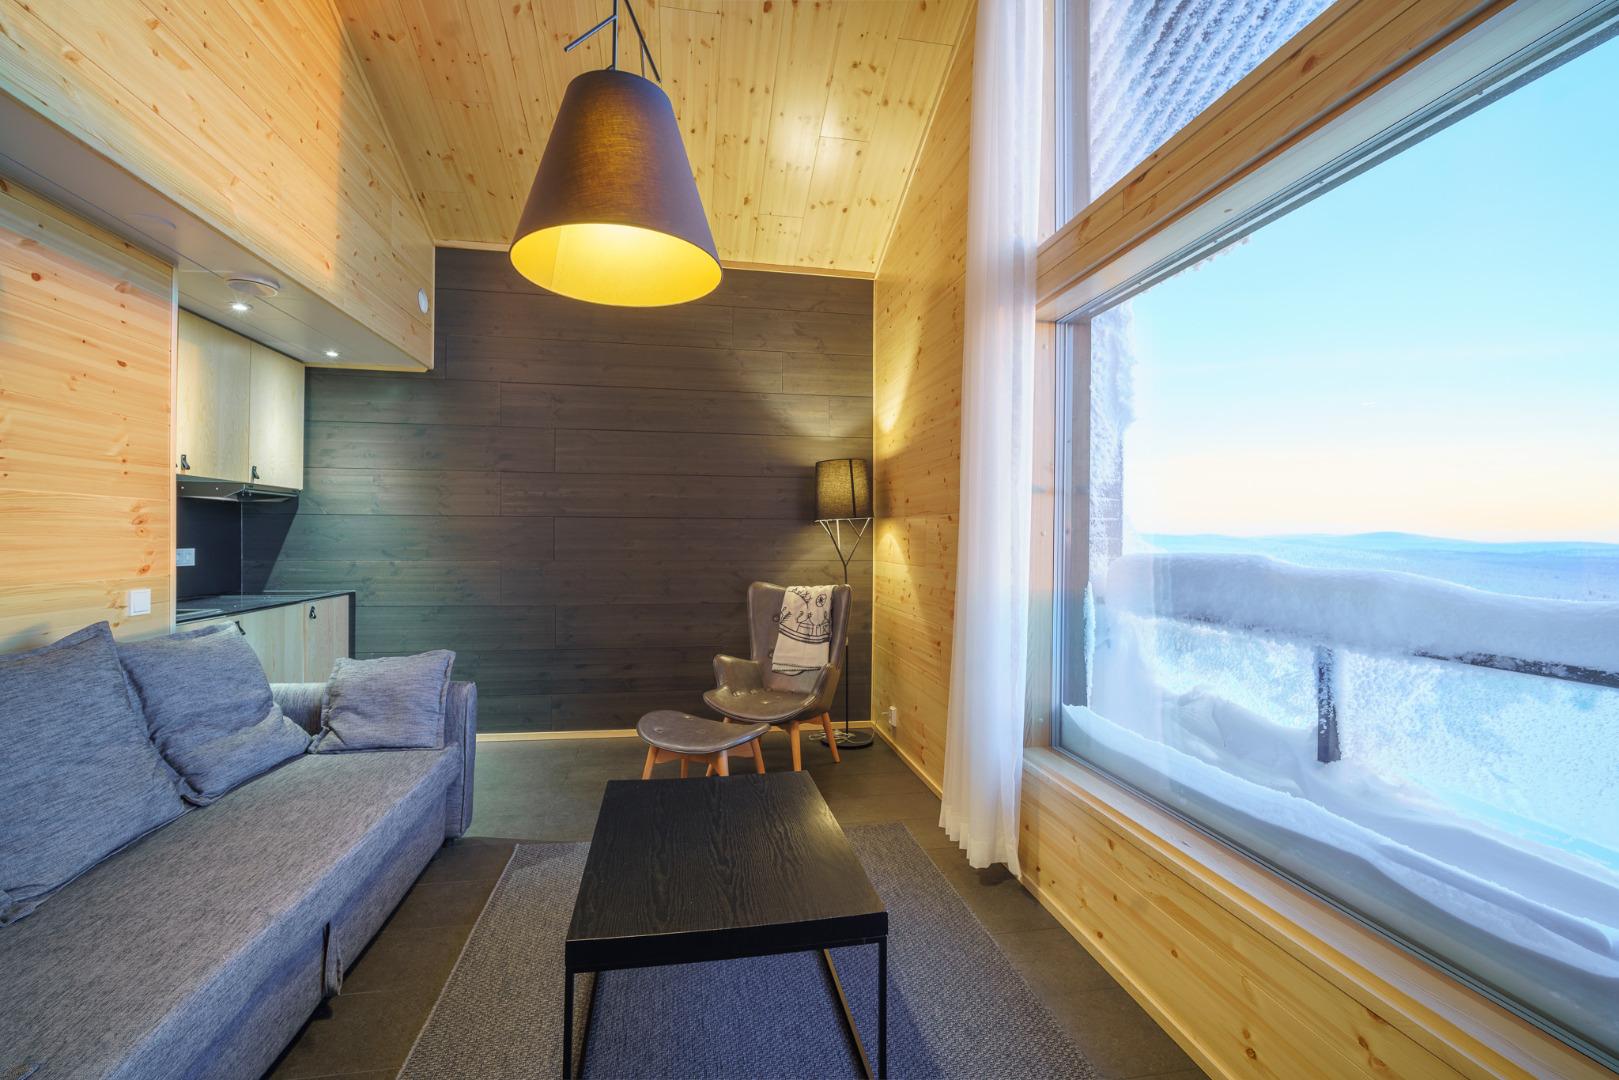 Star Arctic Hotel - Type C Suite with Sauna